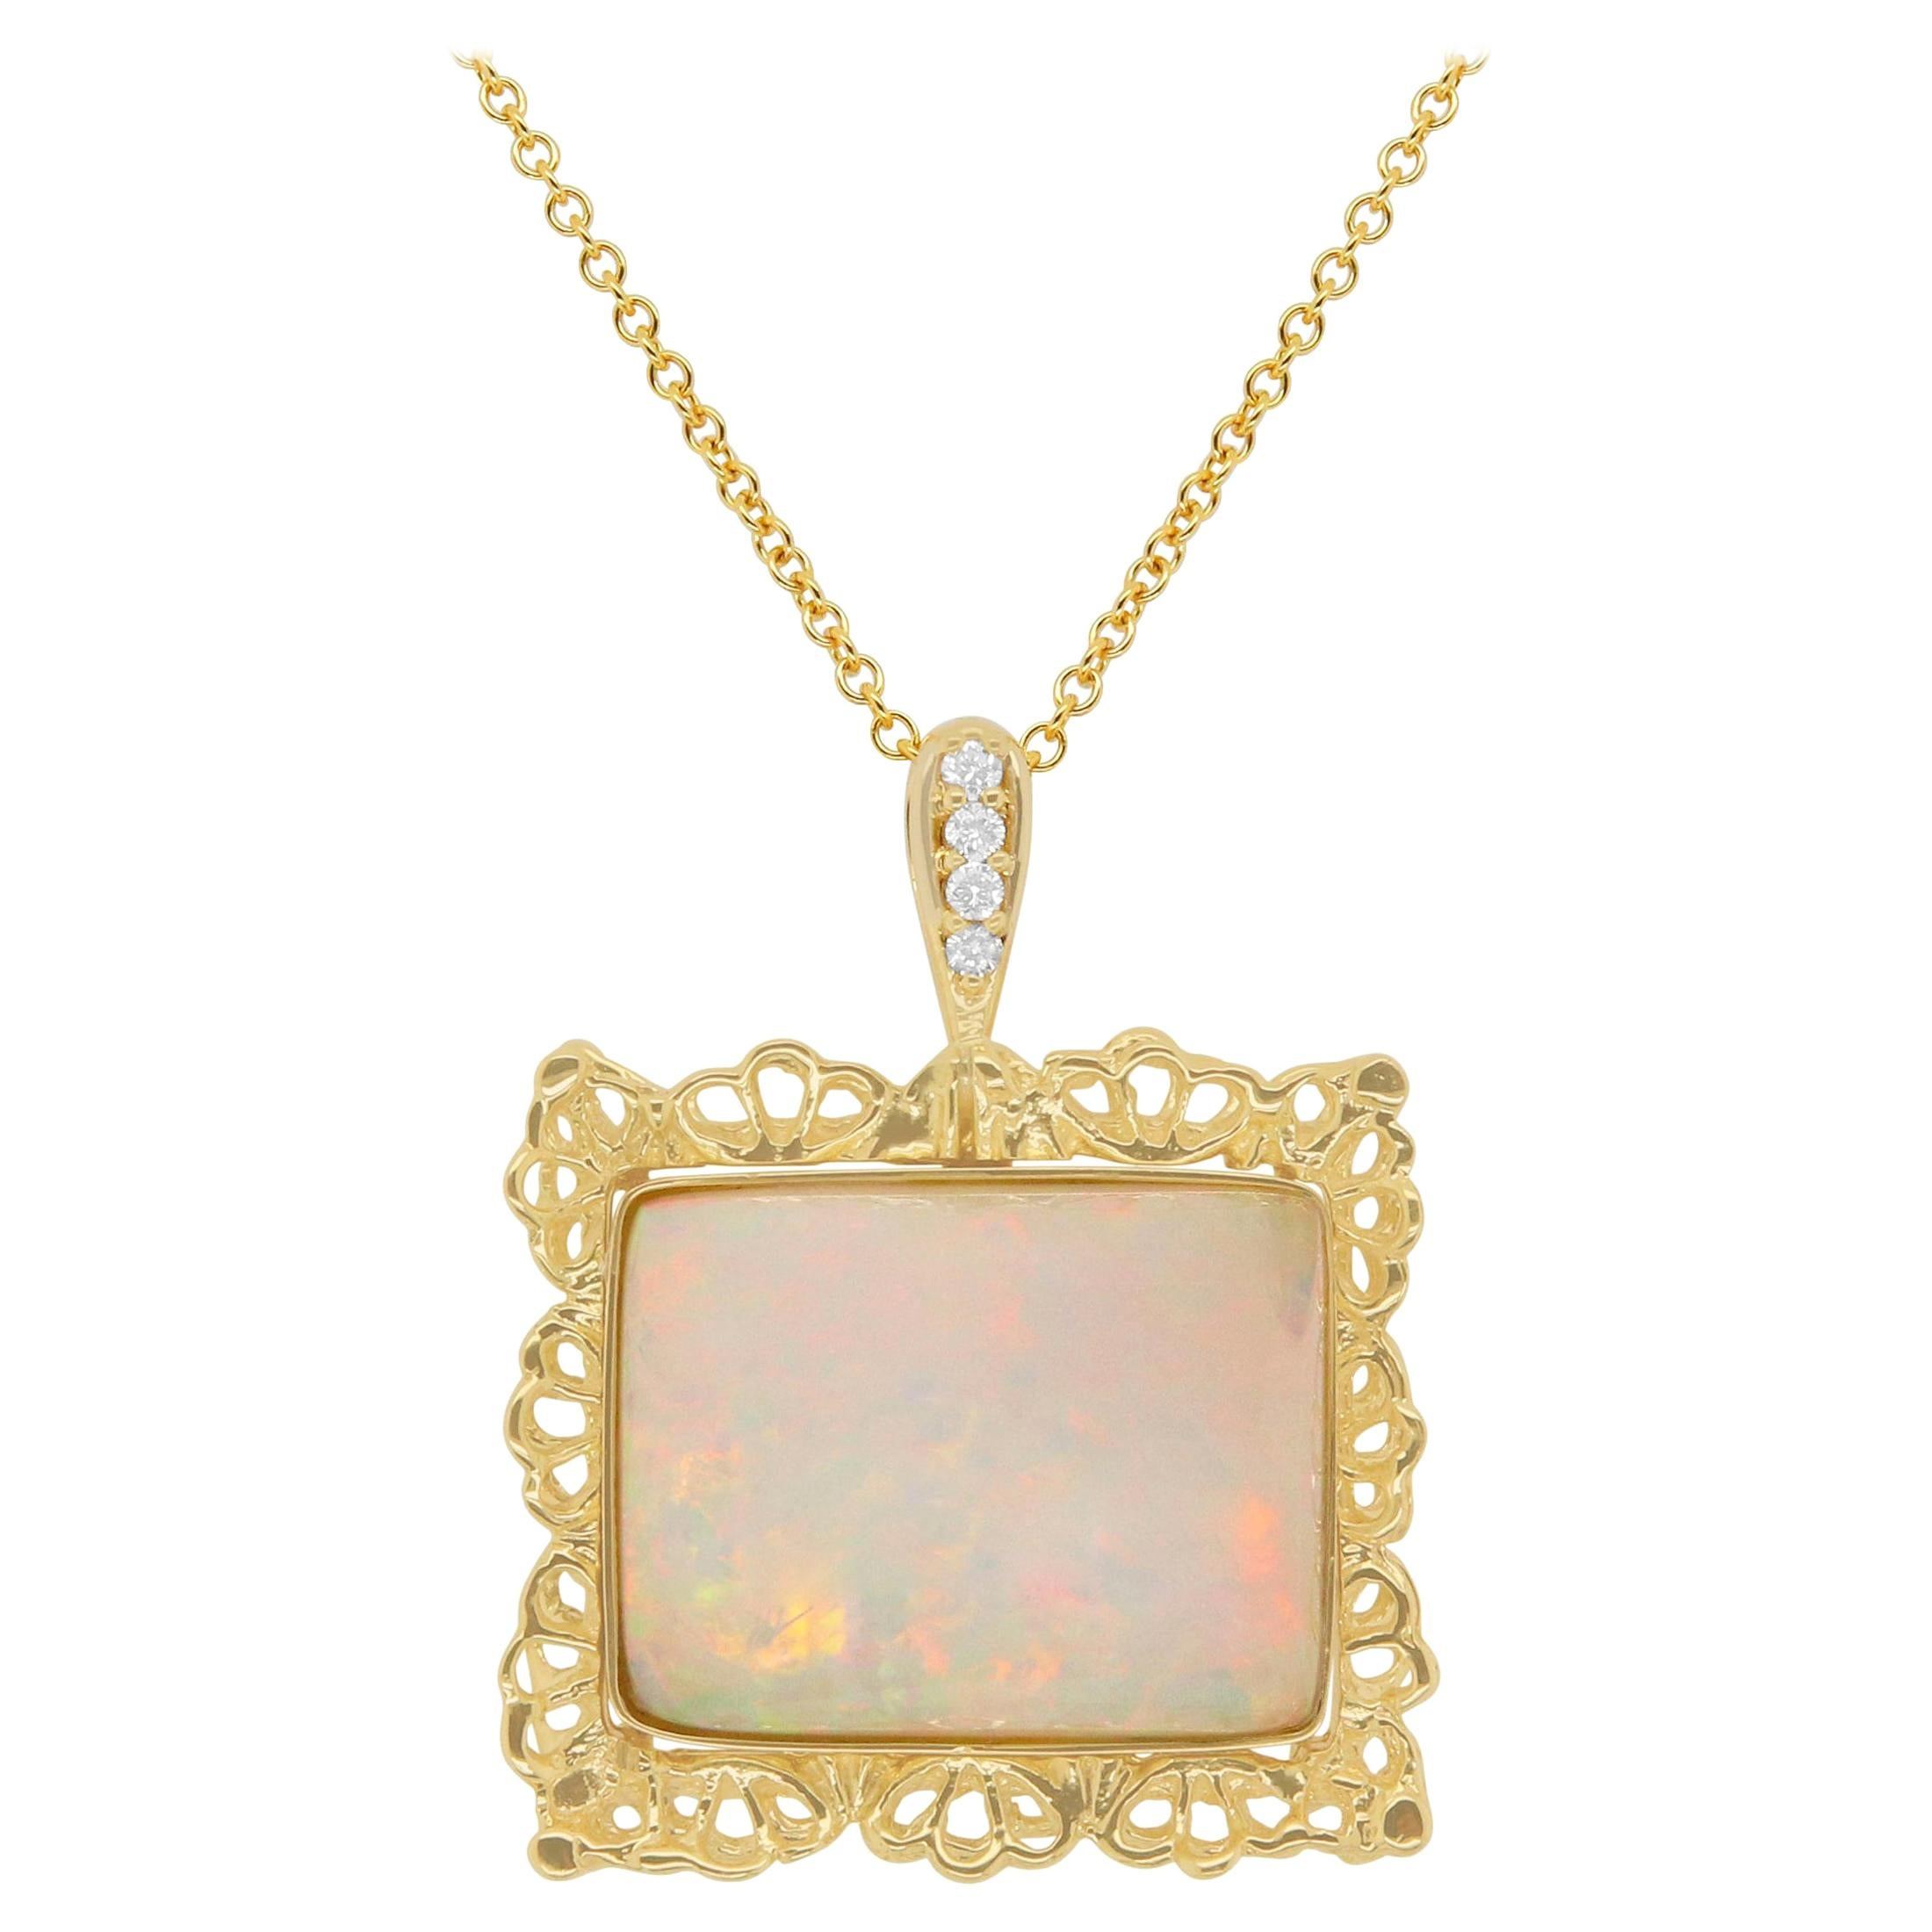 17.60 Carat Emerald Cut Opal and Round White Diamond Pendant 18K Yellow Gold